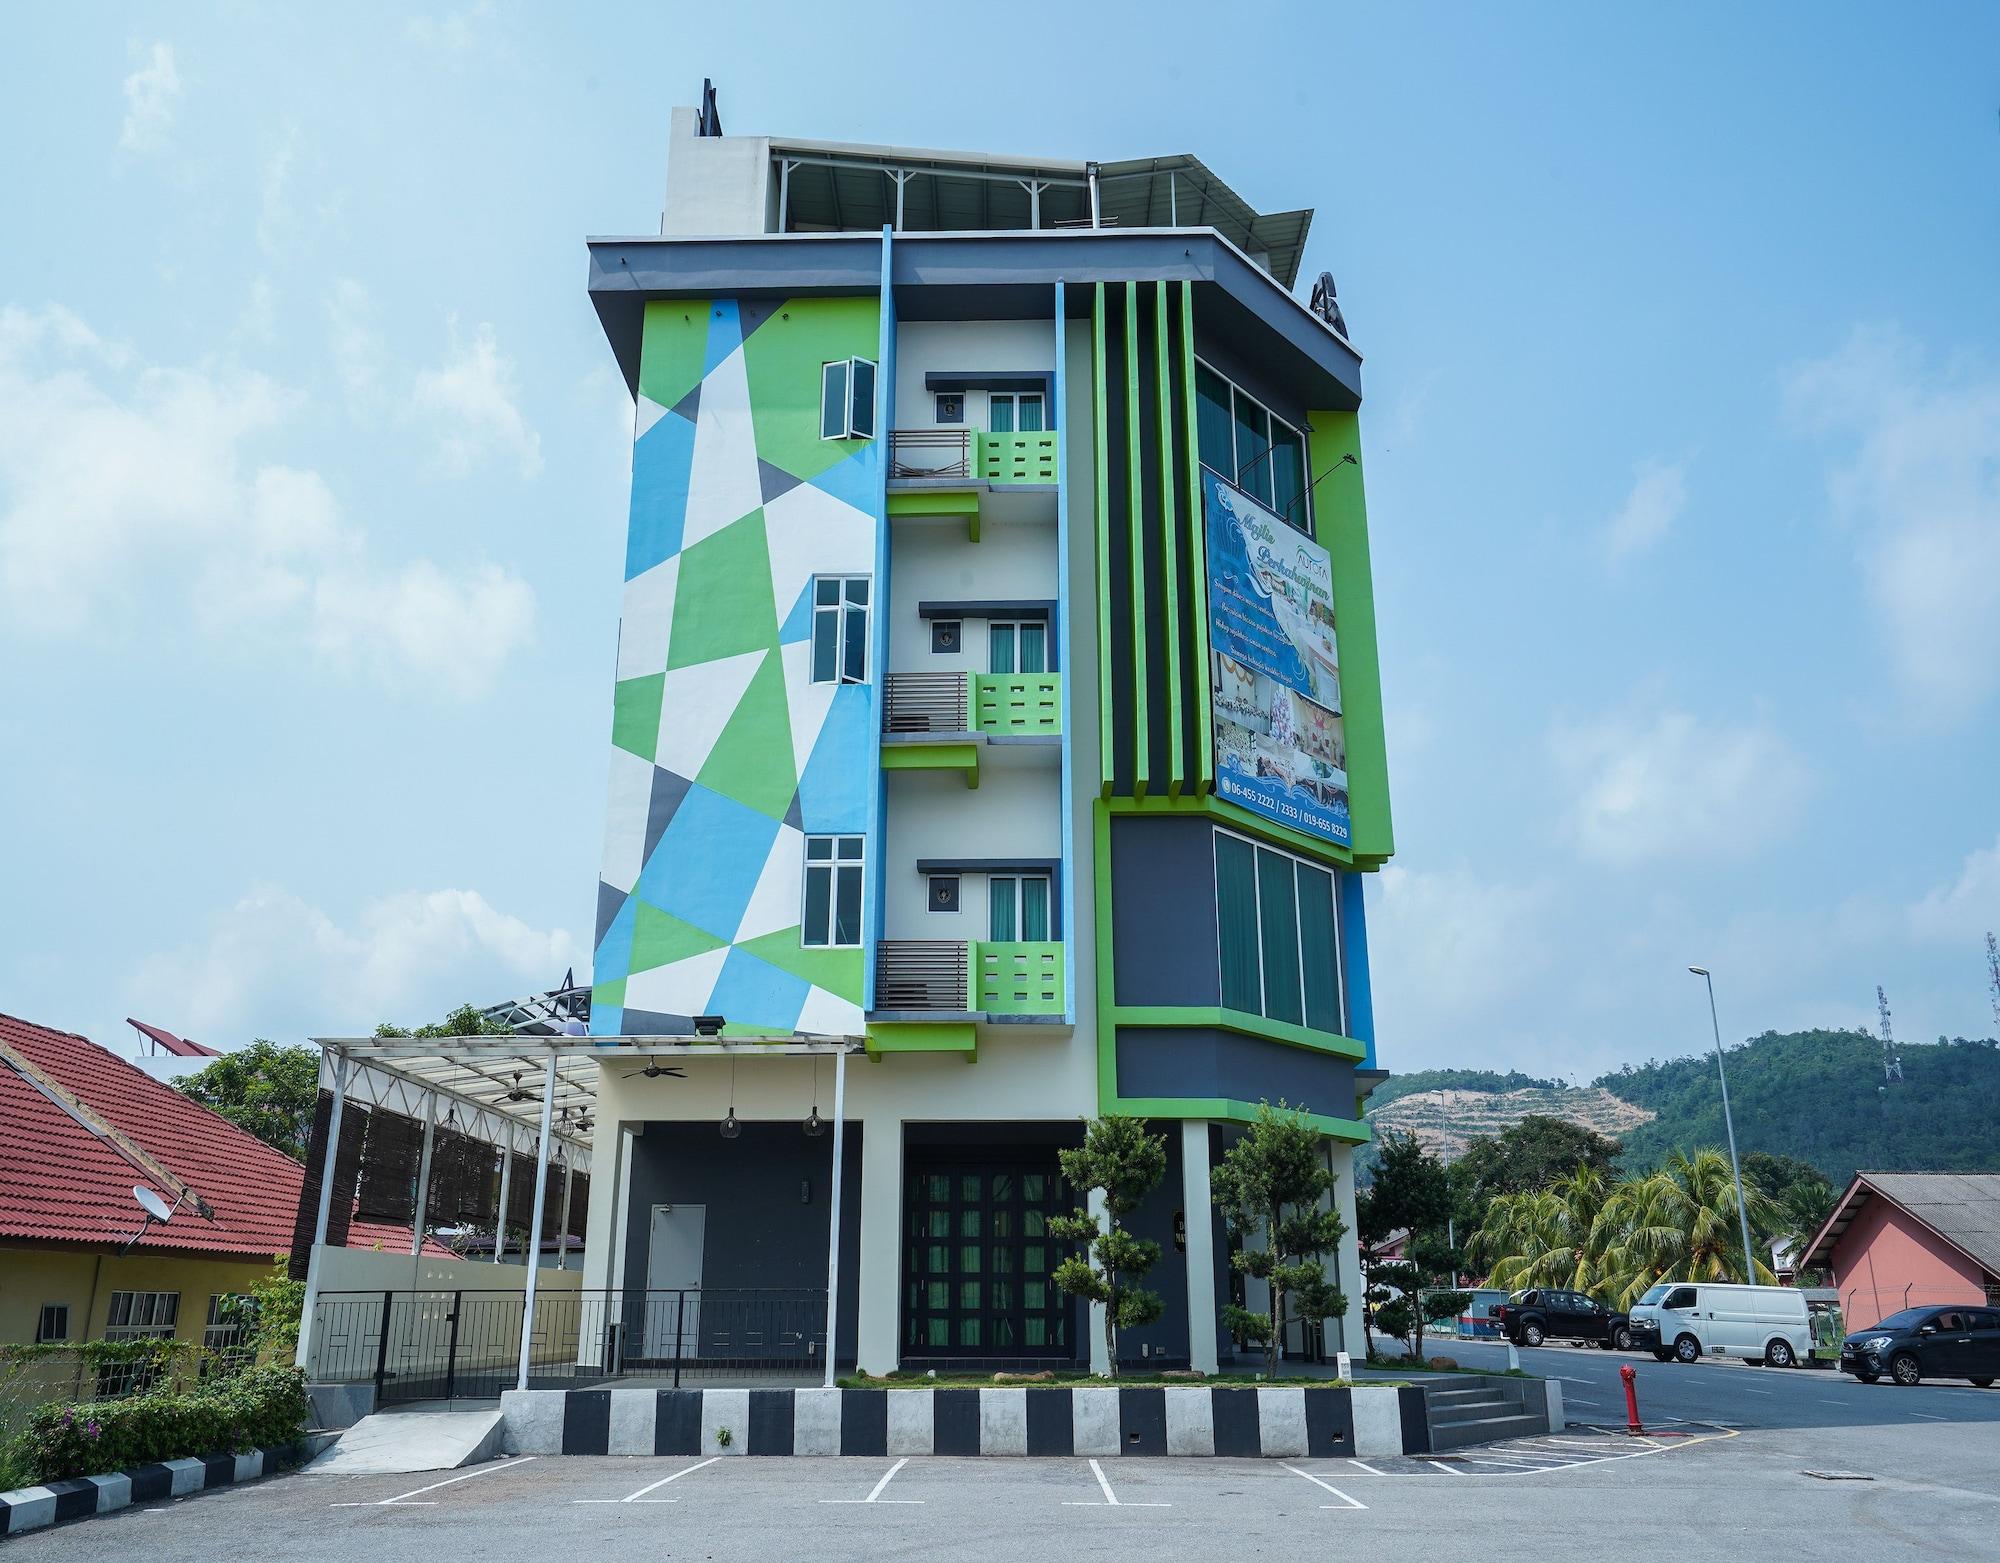 Capital O 89350 Aurora Boutique Hotel, Hulu Selangor